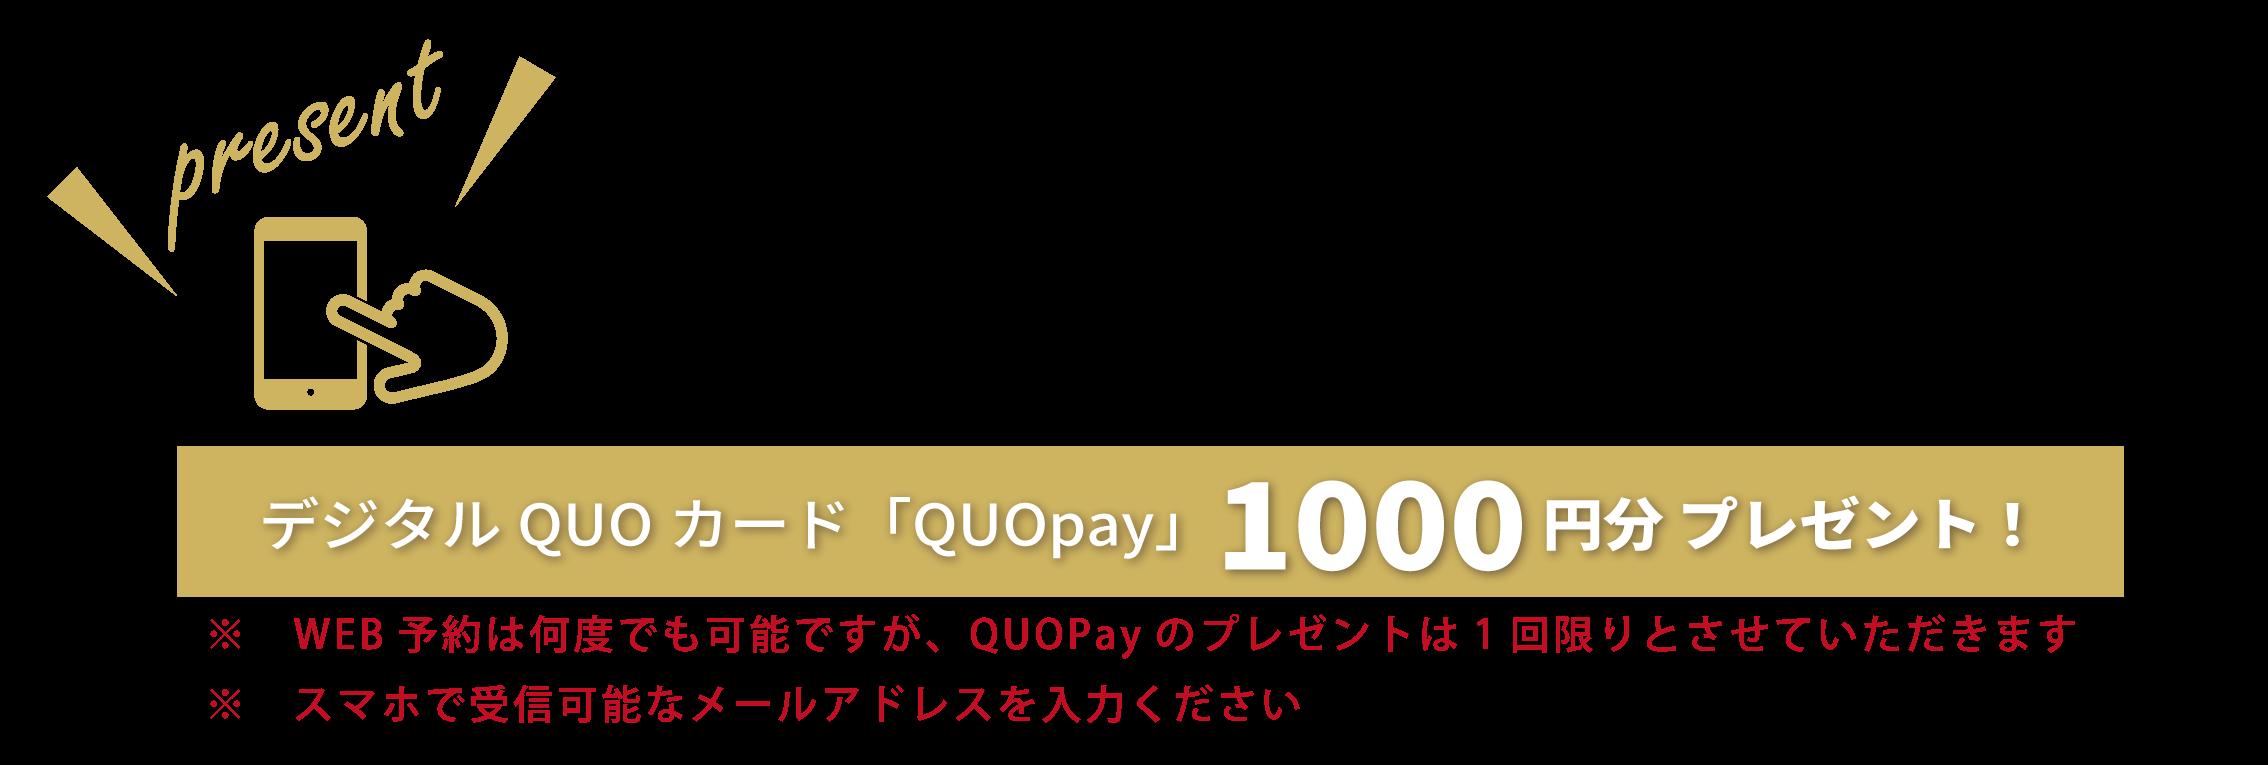 CV_q1000